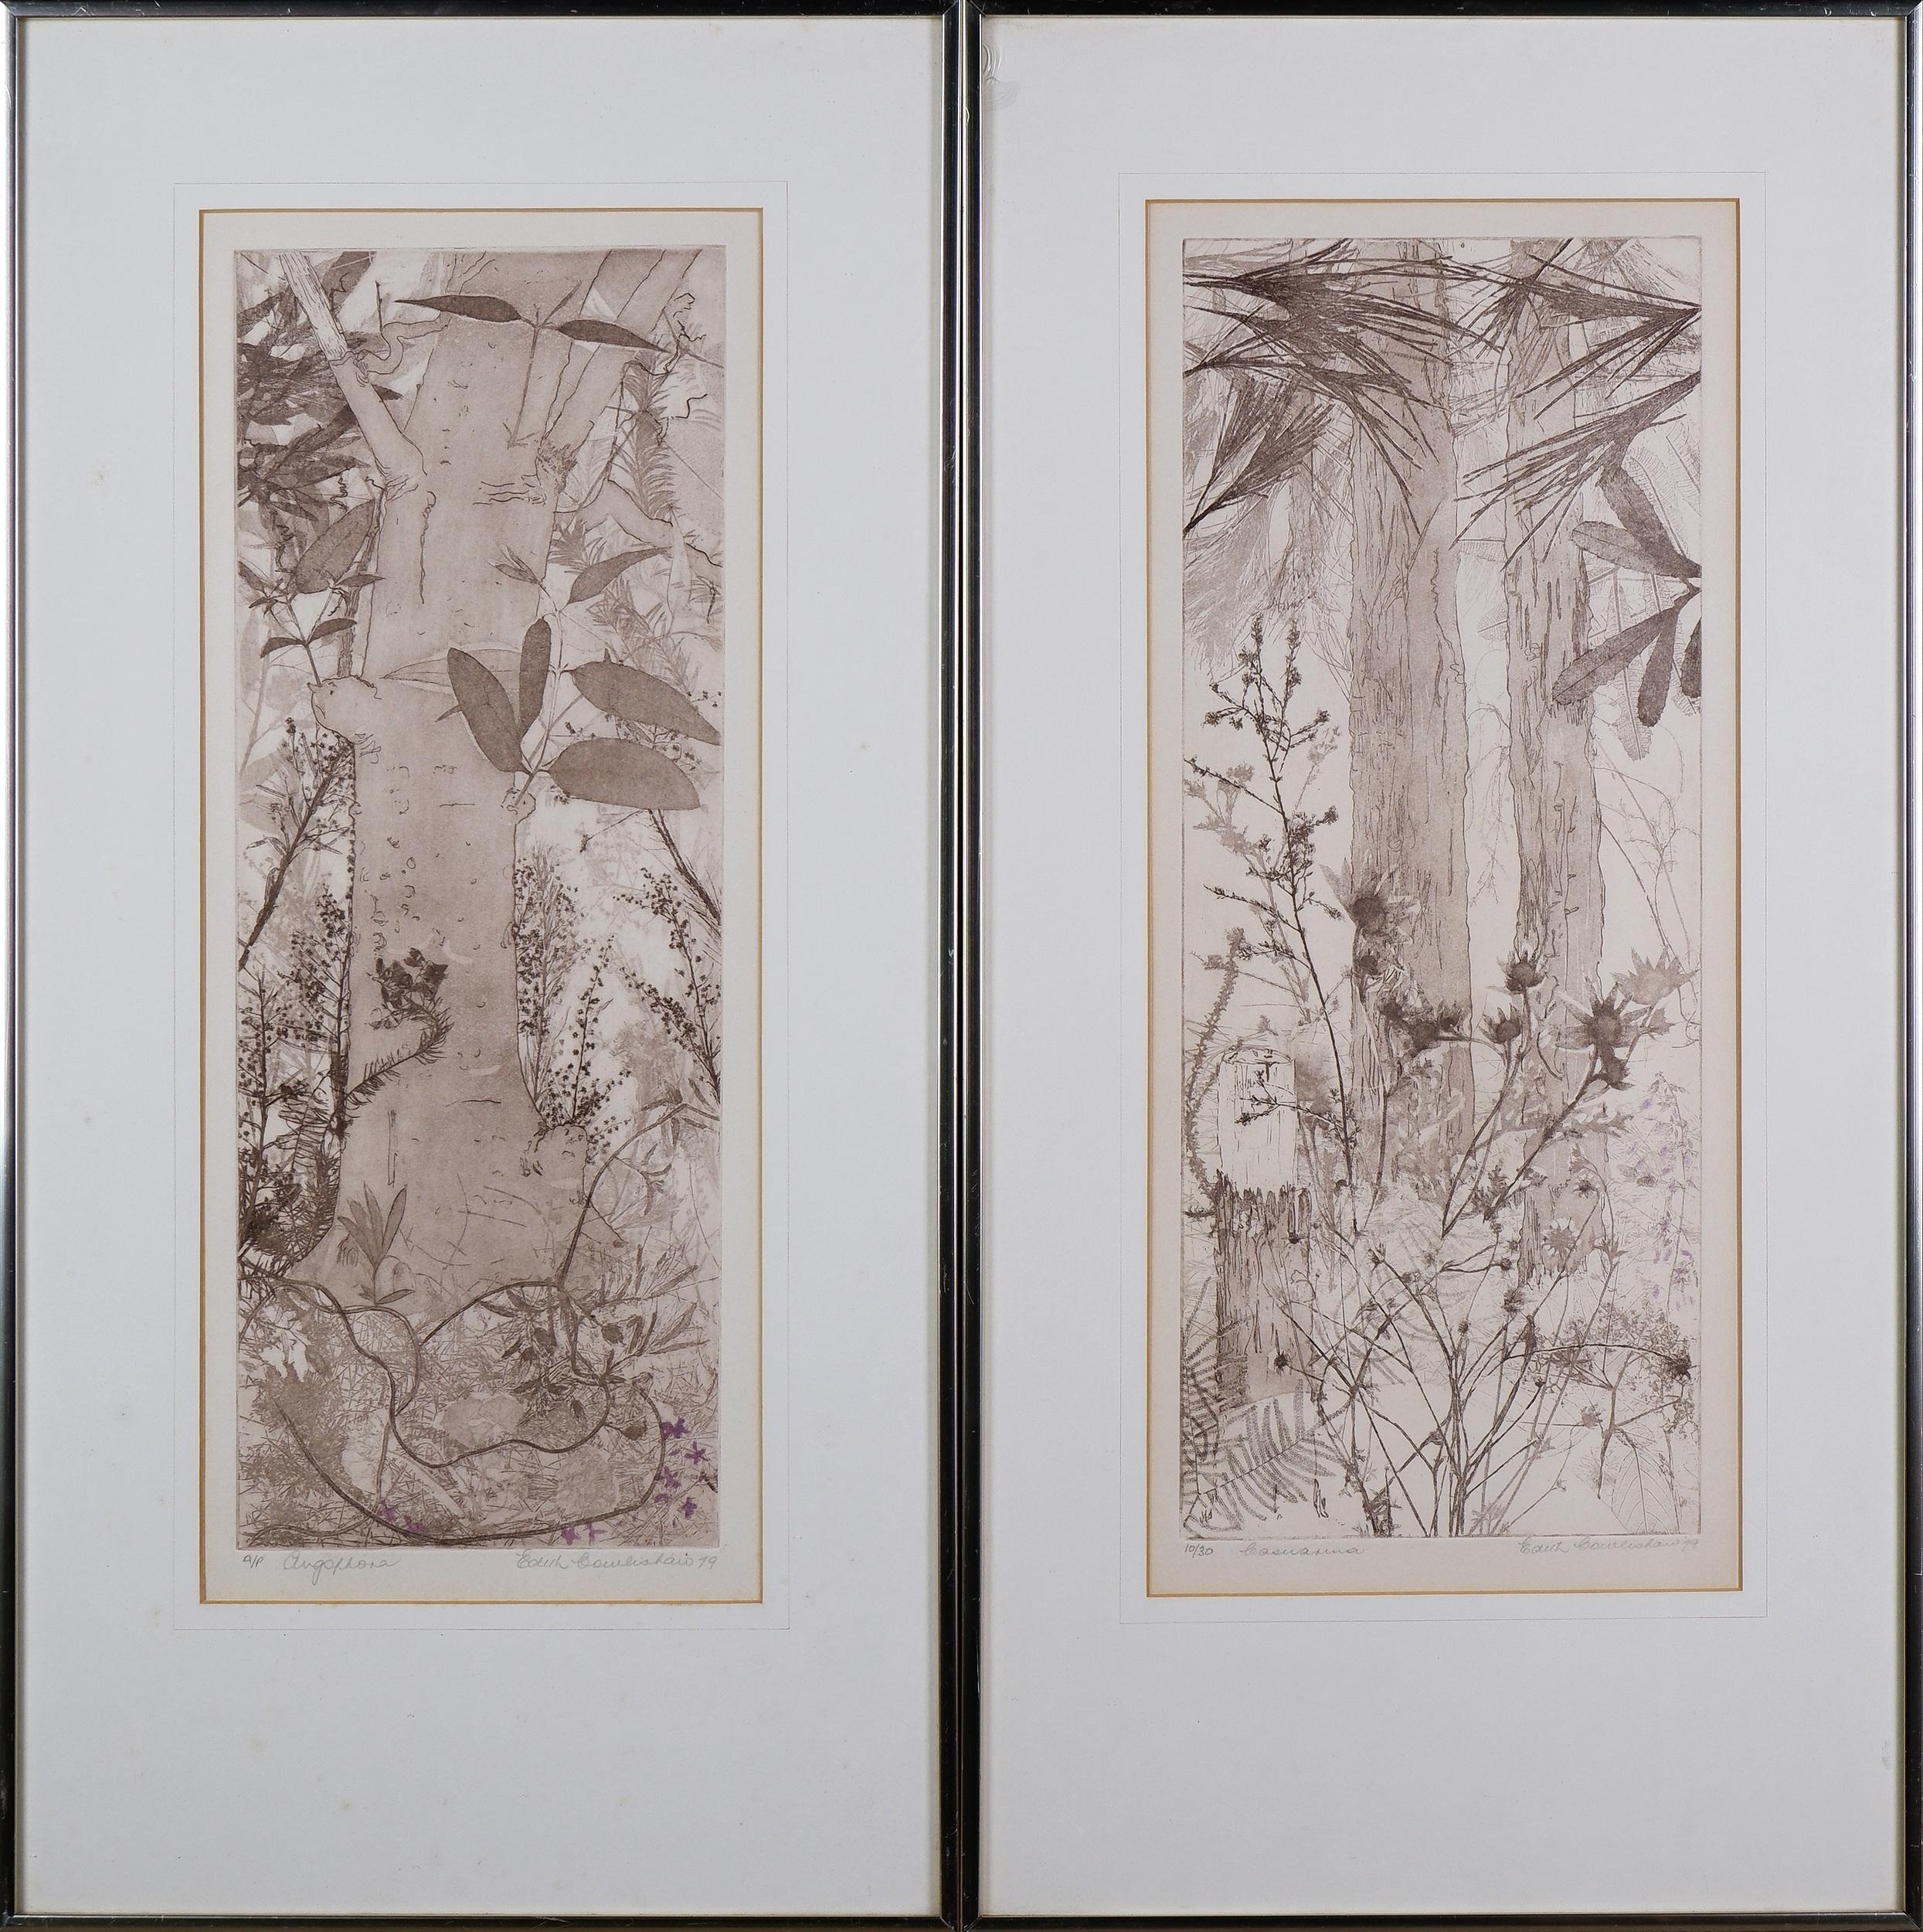 'Edith Cowlishaw (born 1924), Casuarina & Angophora 1979, Etching'